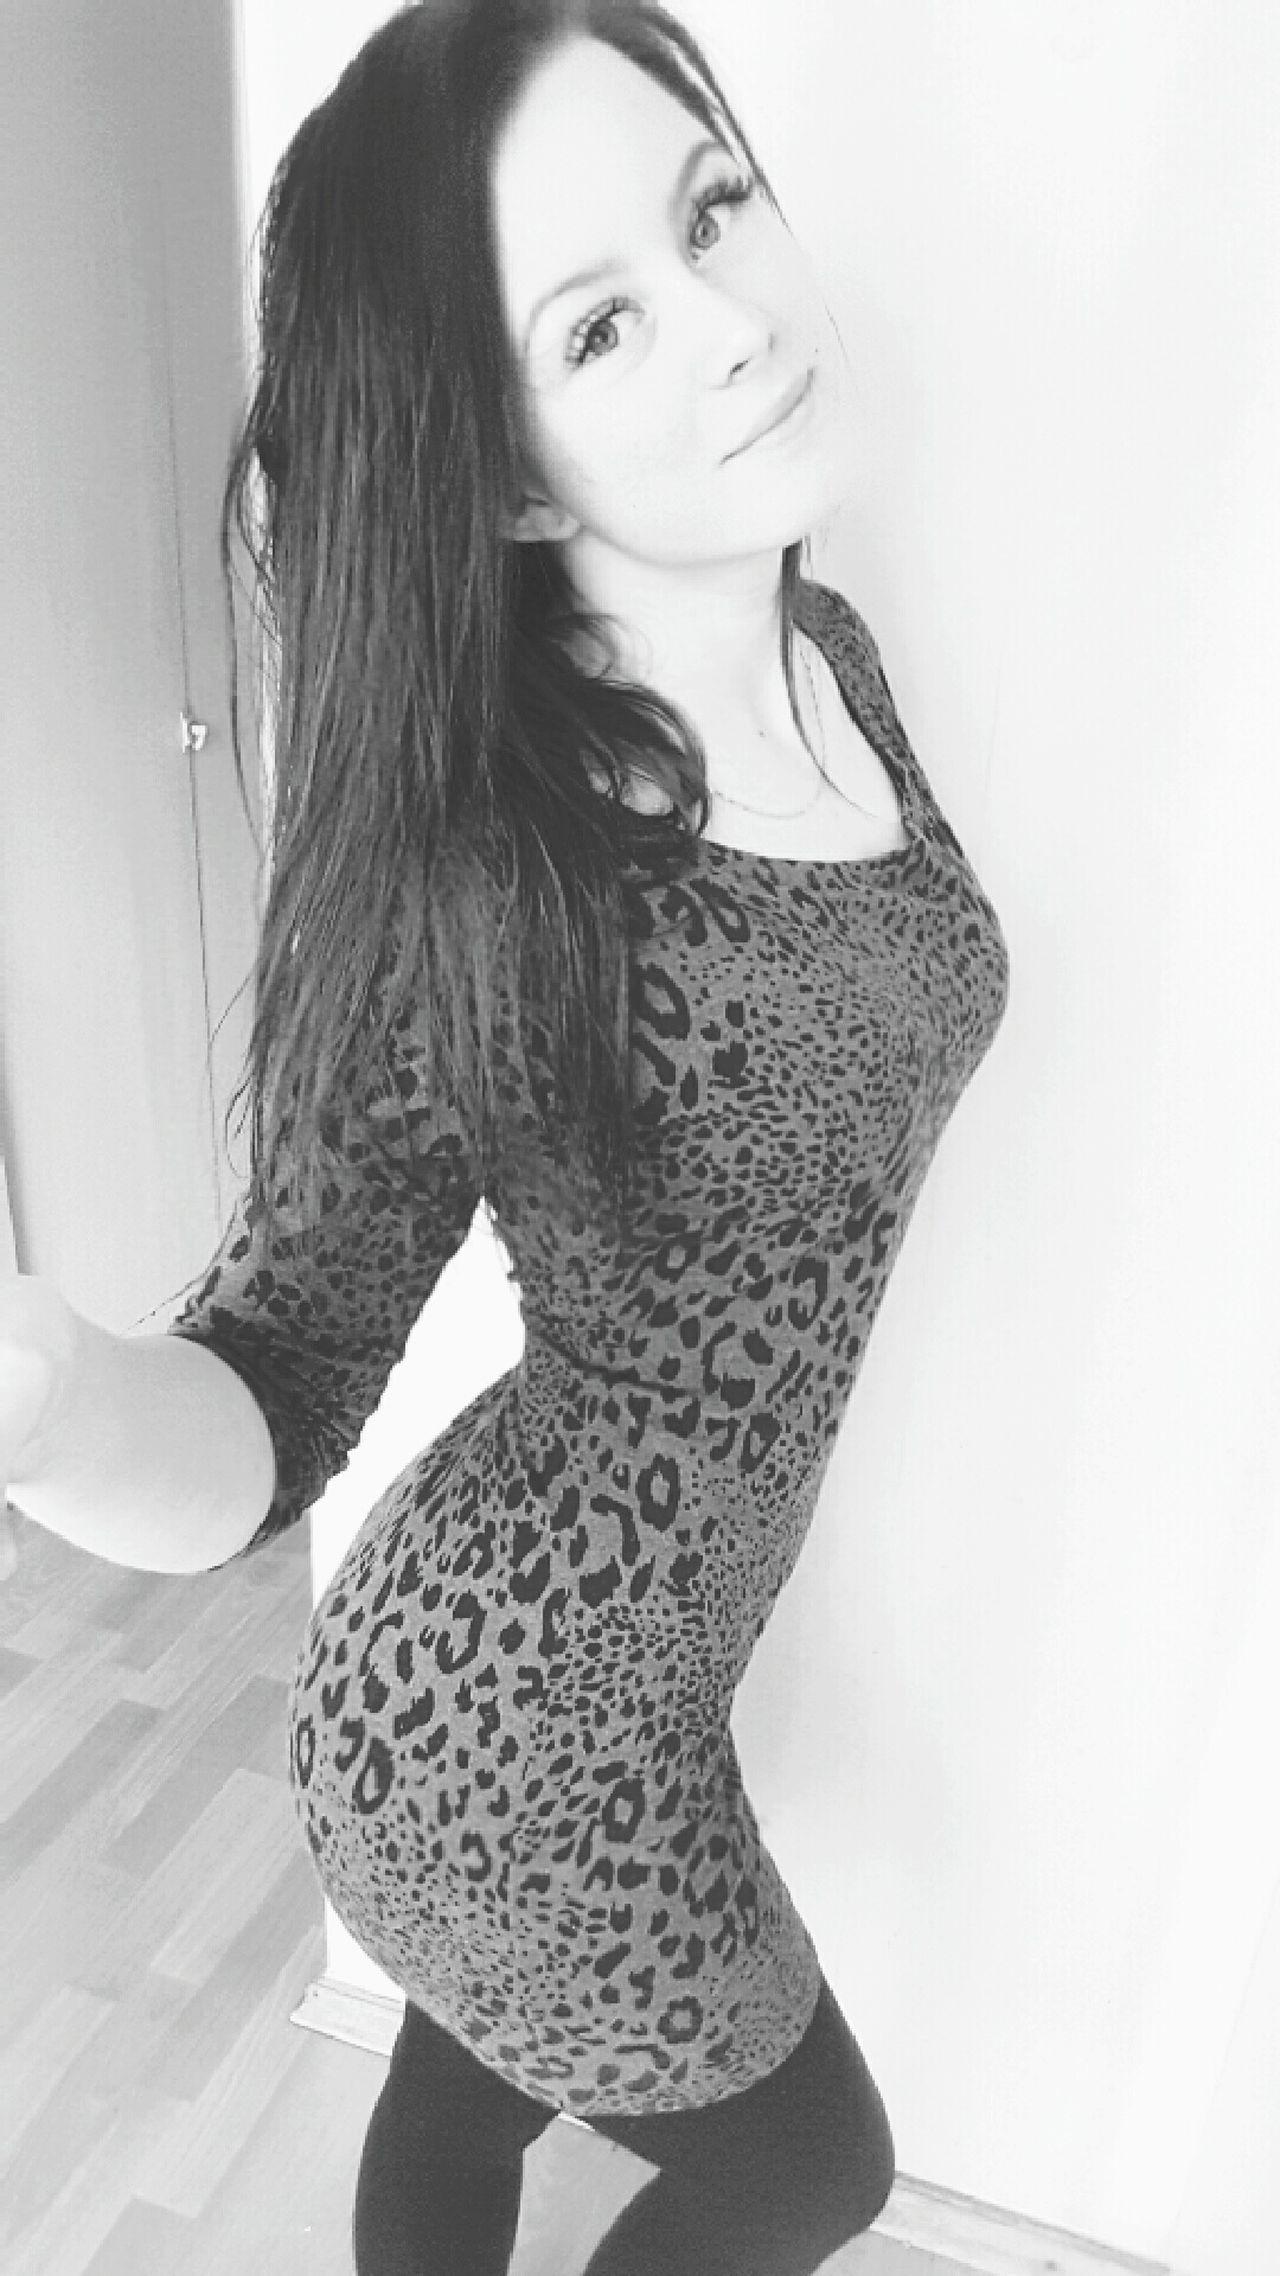 Followme Datass Lithuaniagirl Self Portrait Selfie ✌ Love My Self <3 Blackandwhite Black & White Grey Mostbeautifulwoman